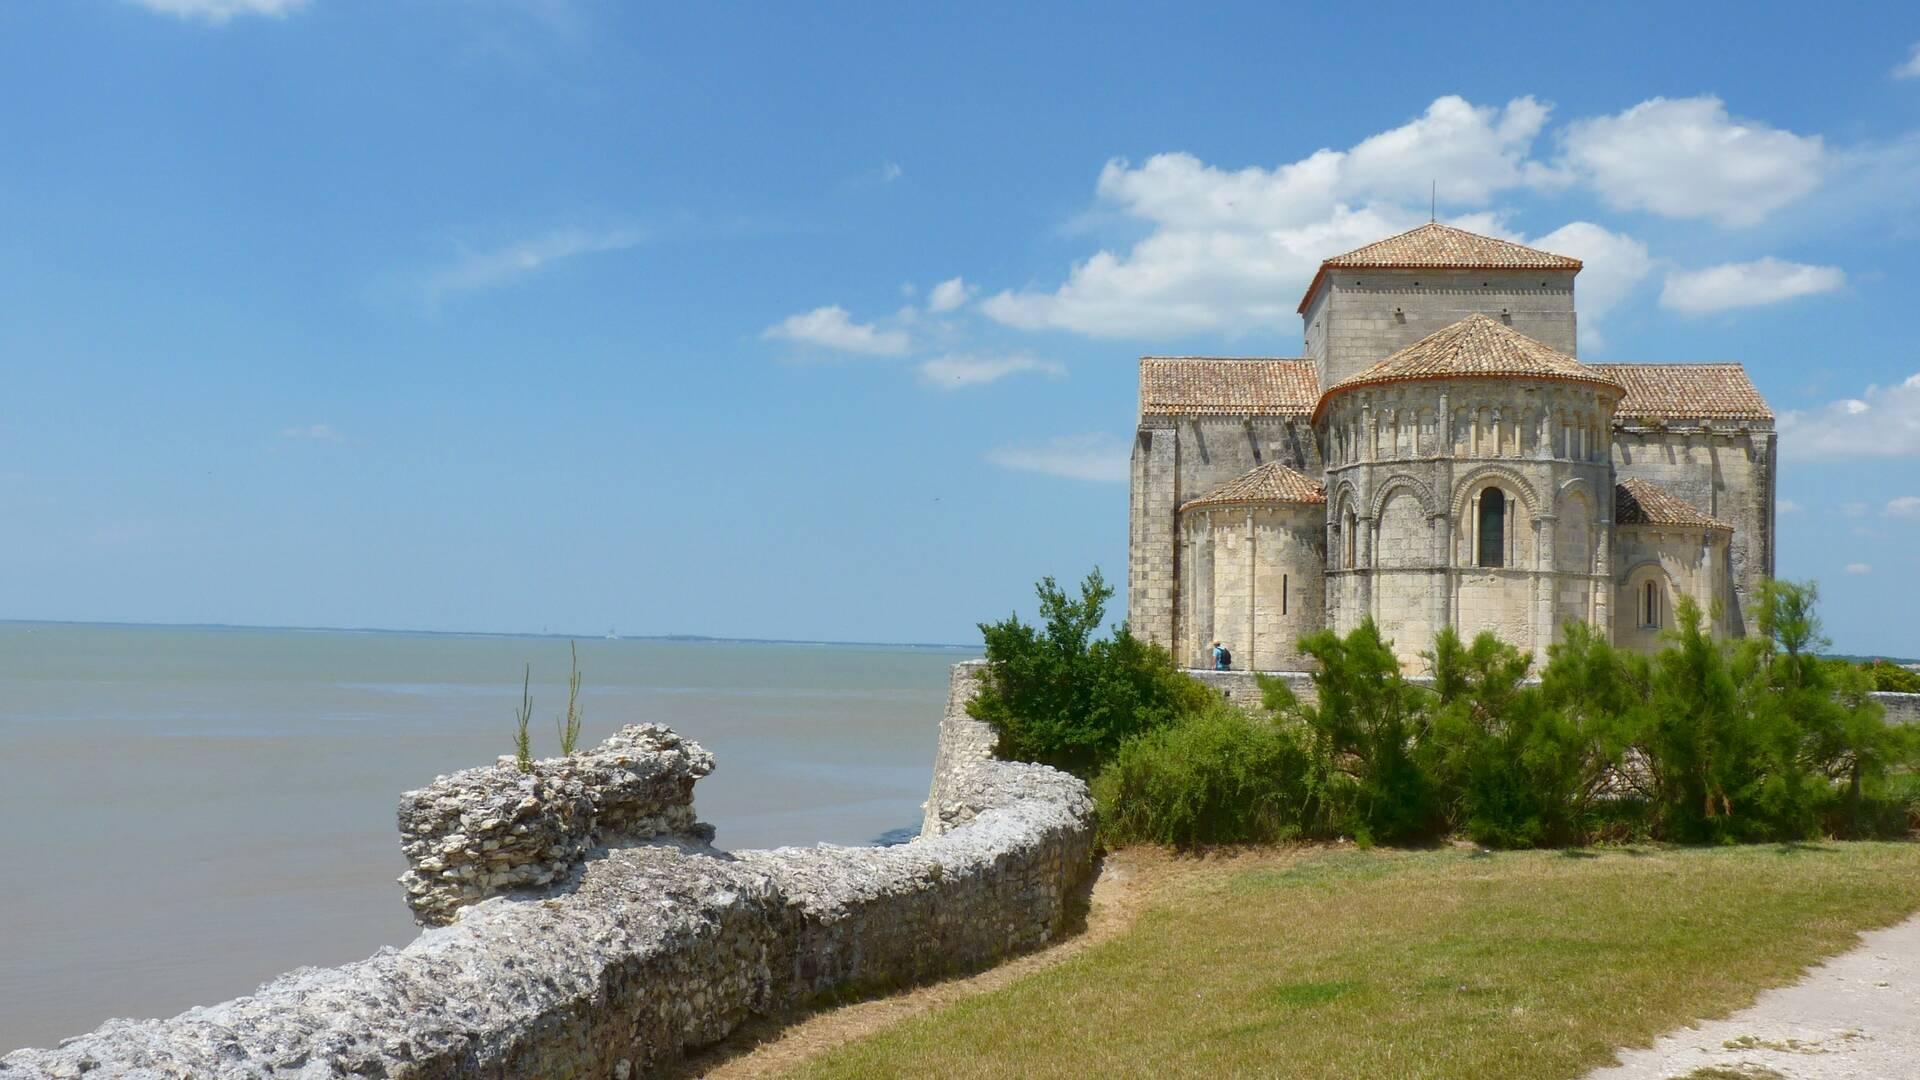 Chevet de l'église romane Sainte-Radegonde © FDHPA 17